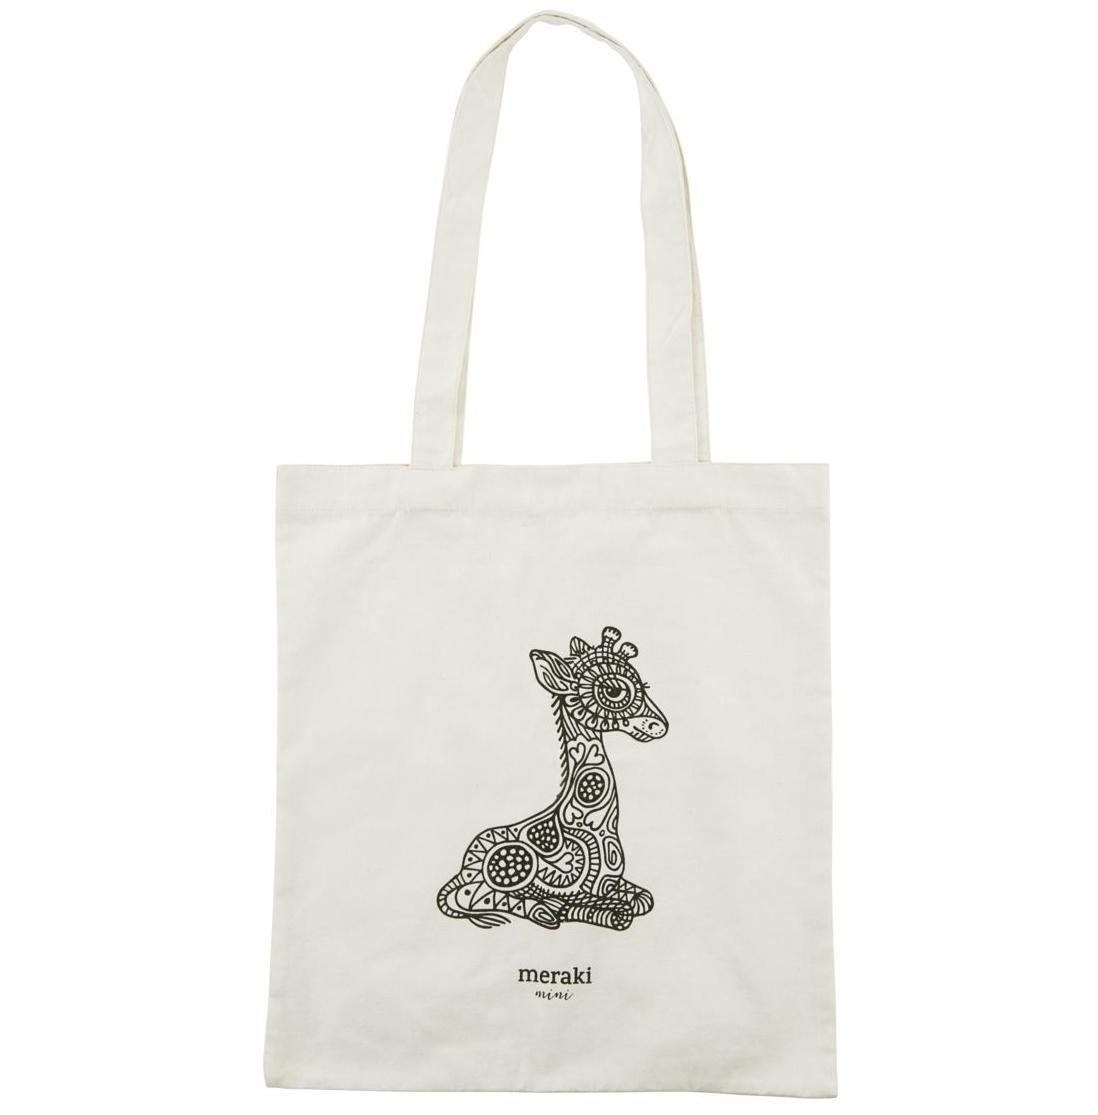 meraki Plátěná taška Meraki Mini, béžová barva, černá barva, krémová barva, textil